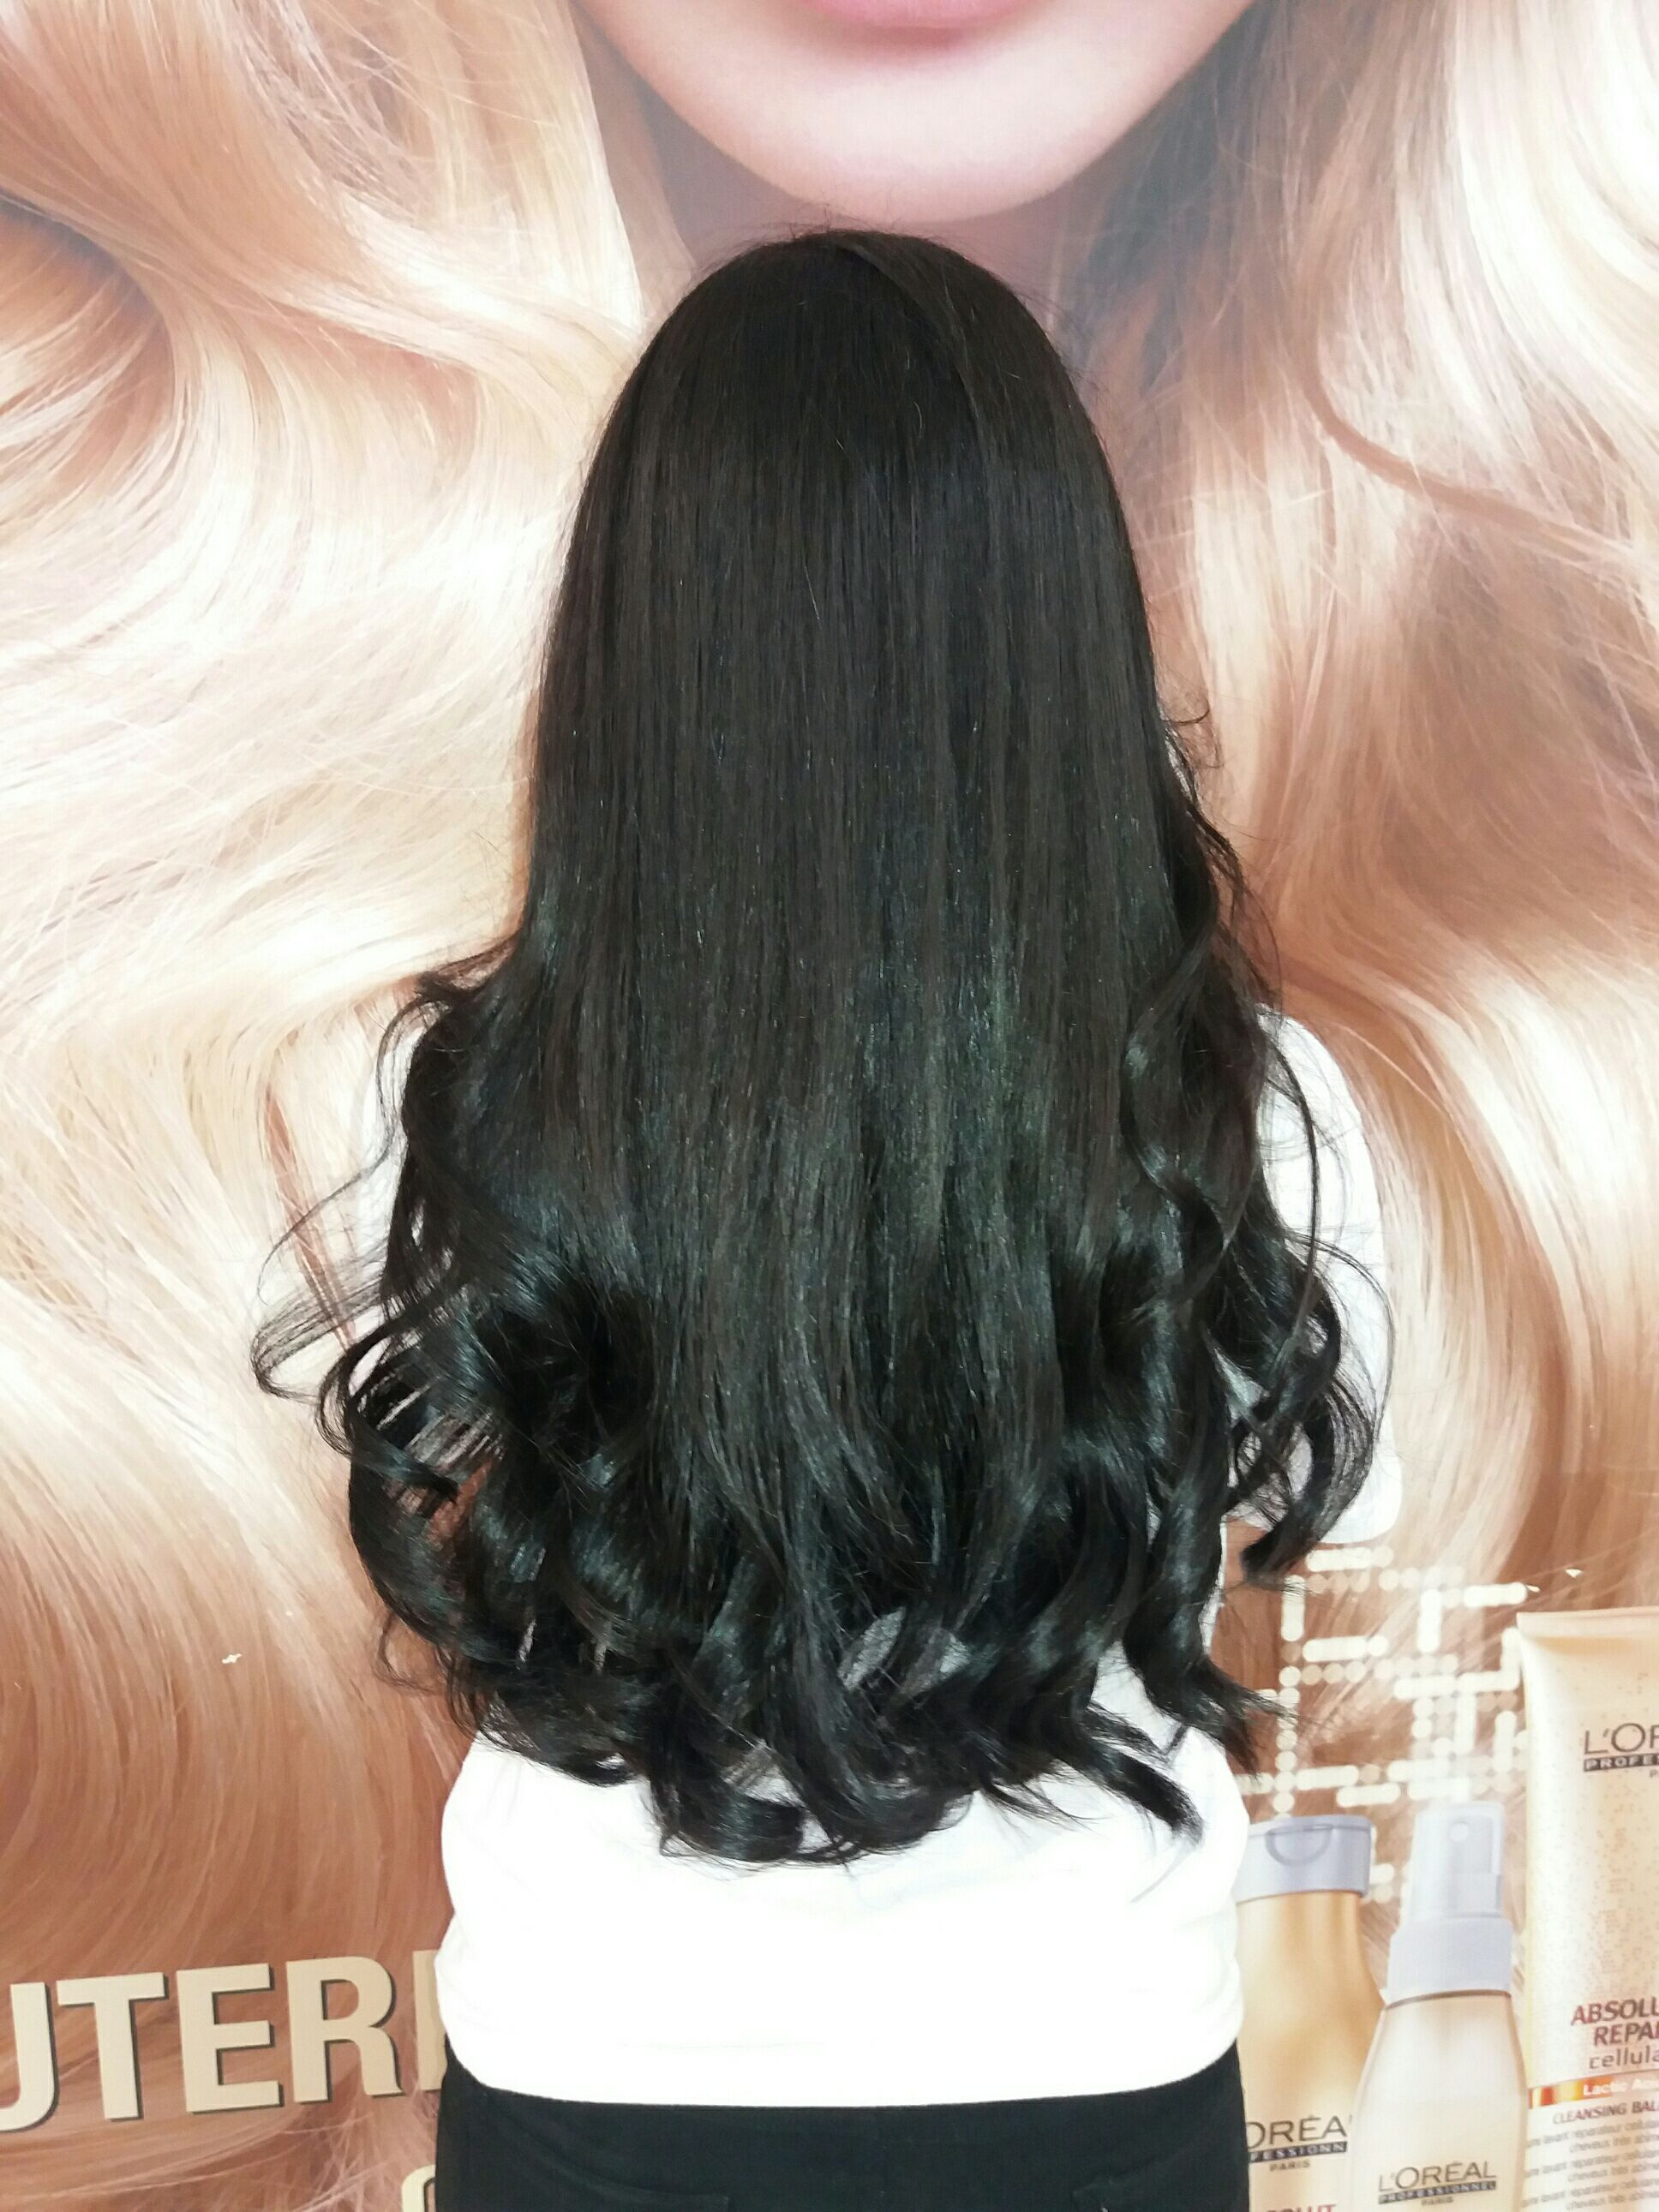 cabelo auxiliar cabeleireiro(a) auxiliar cabeleireiro(a) auxiliar cabeleireiro(a)